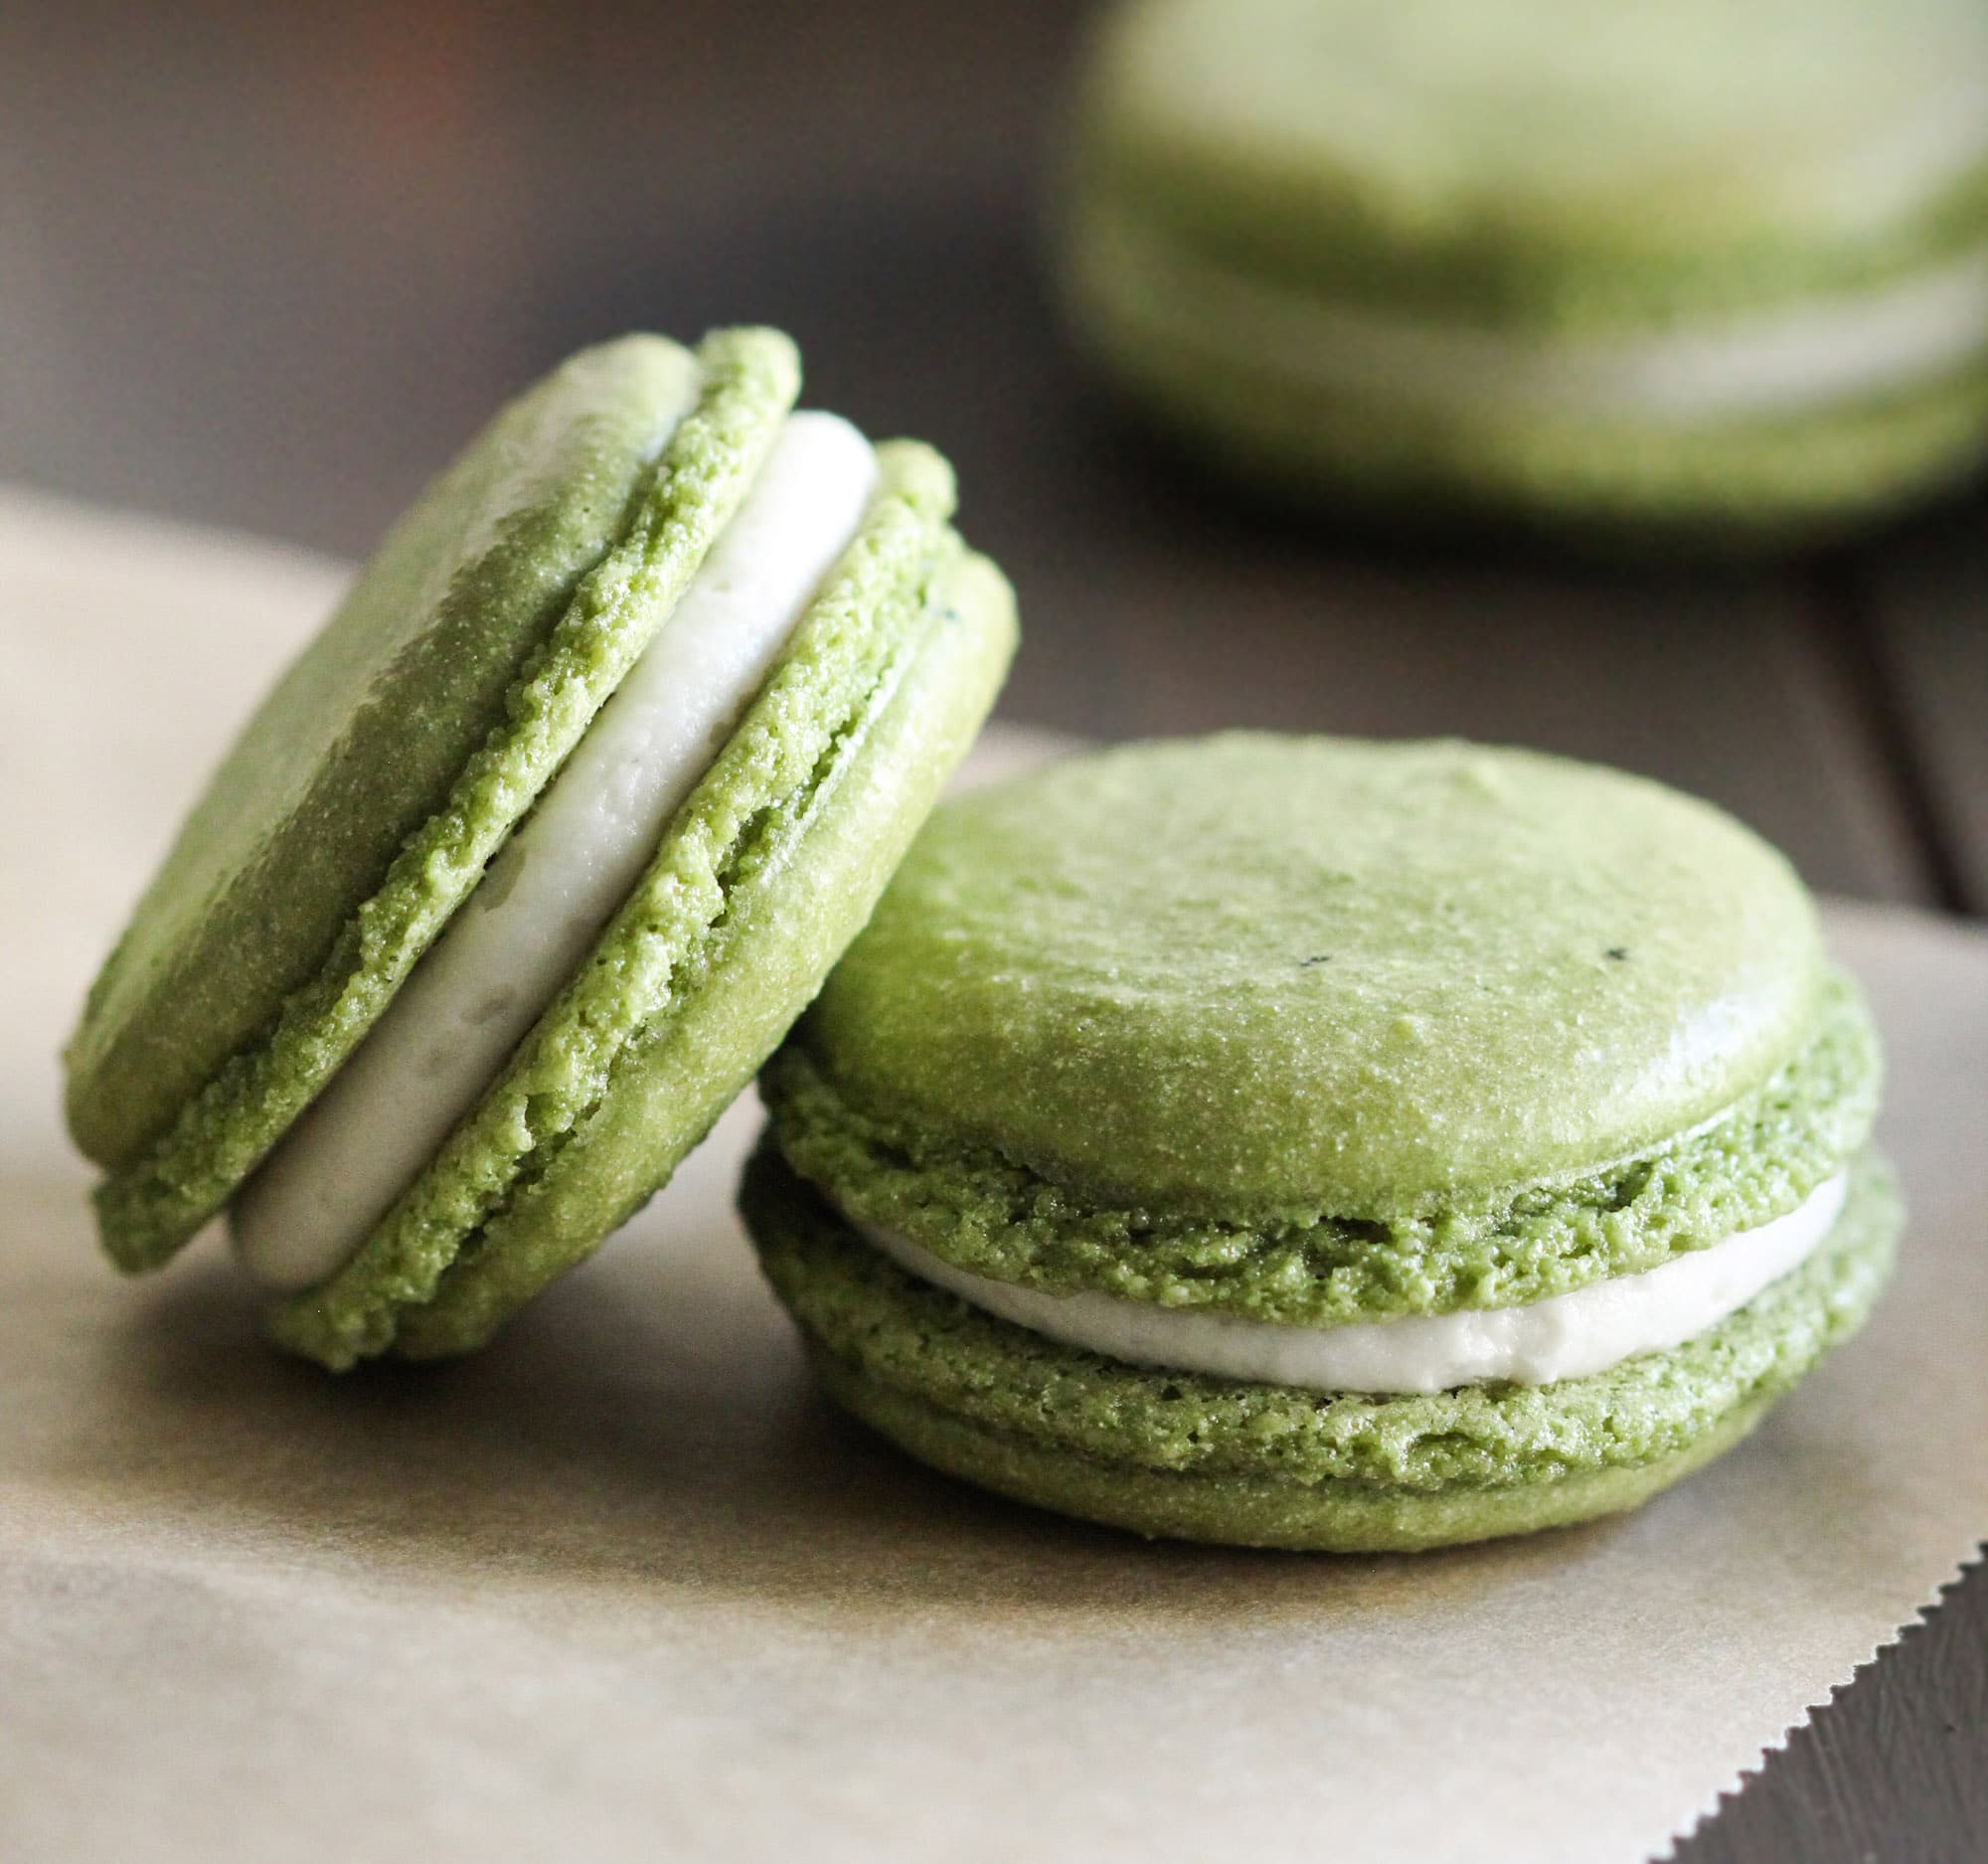 Healthy-Matcha-Green-Tea-French-Macarons